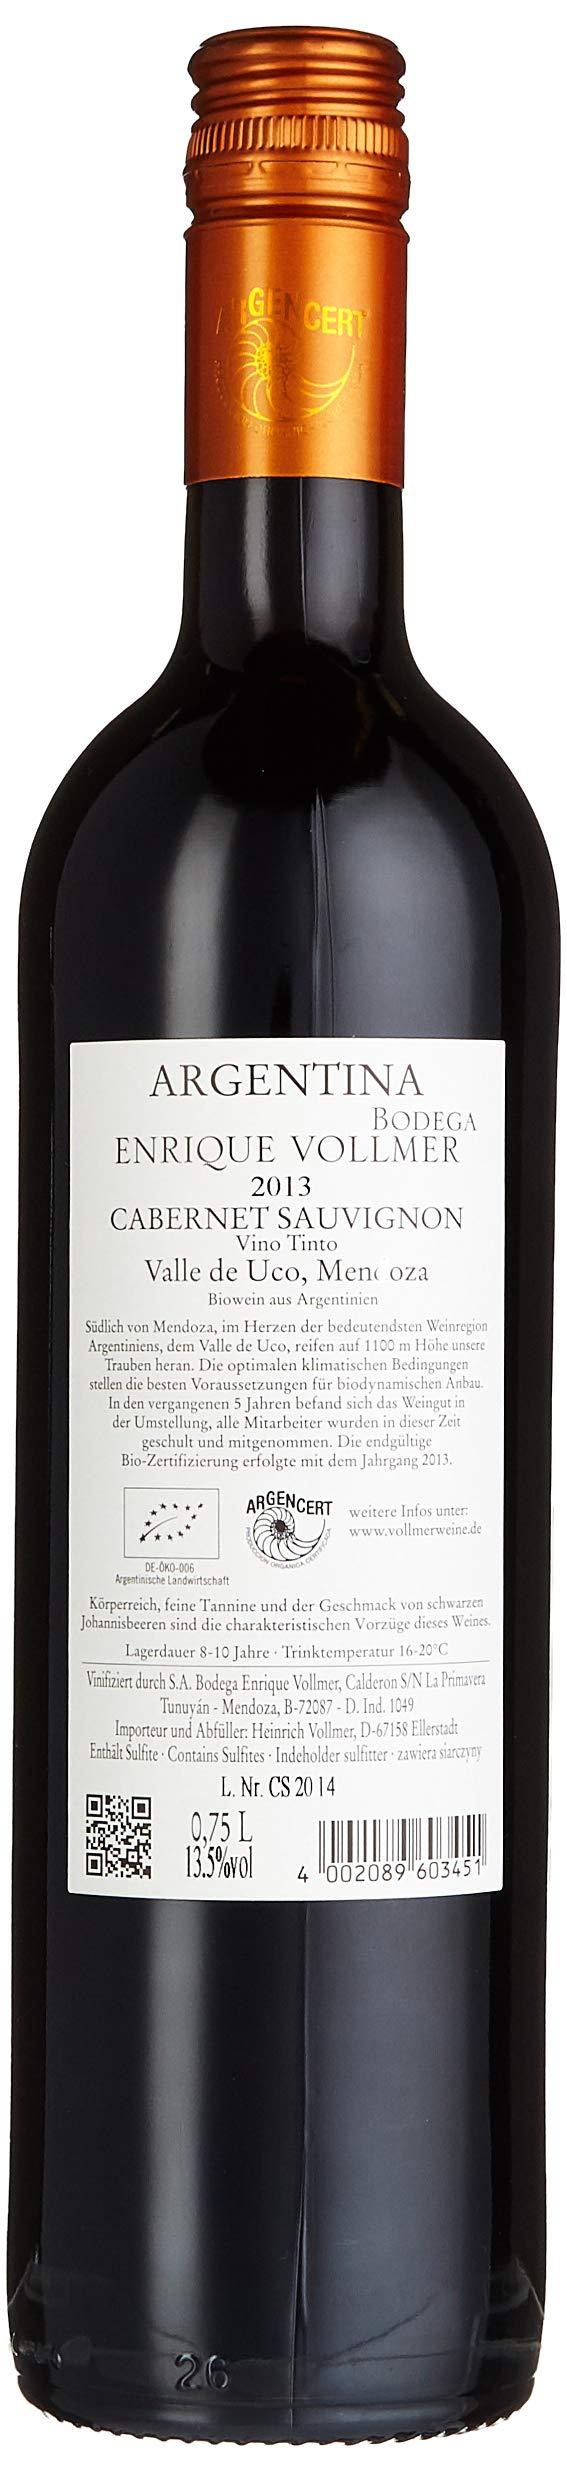 Bodega-Enrique-Vollmer-Cabernet-Sauvignon-2013-trocken-6-x-075-l